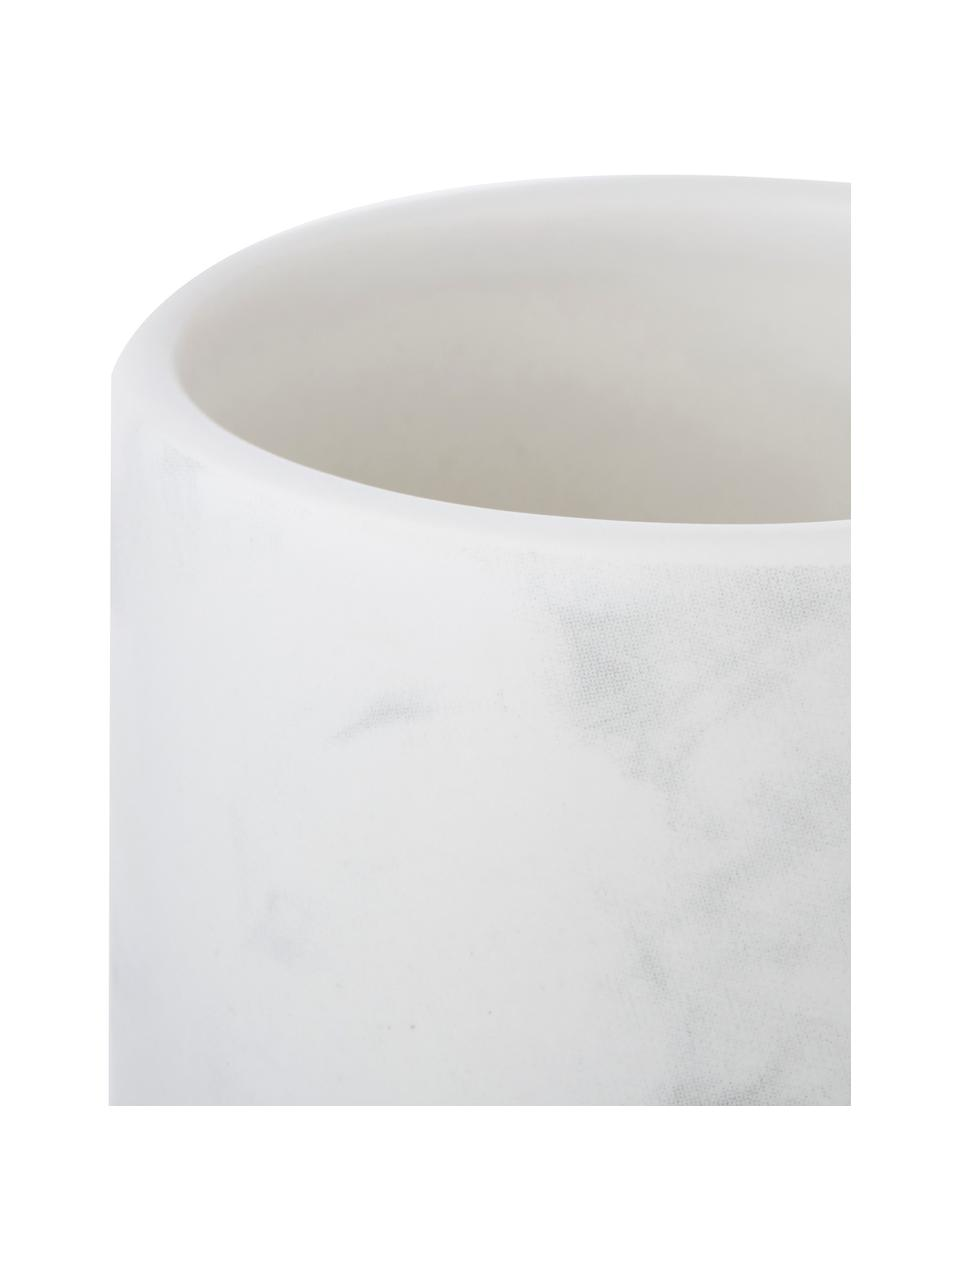 Keramik-Zahnputzbecher Daro, Keramik, Weiß, Ø 7 x H 11 cm